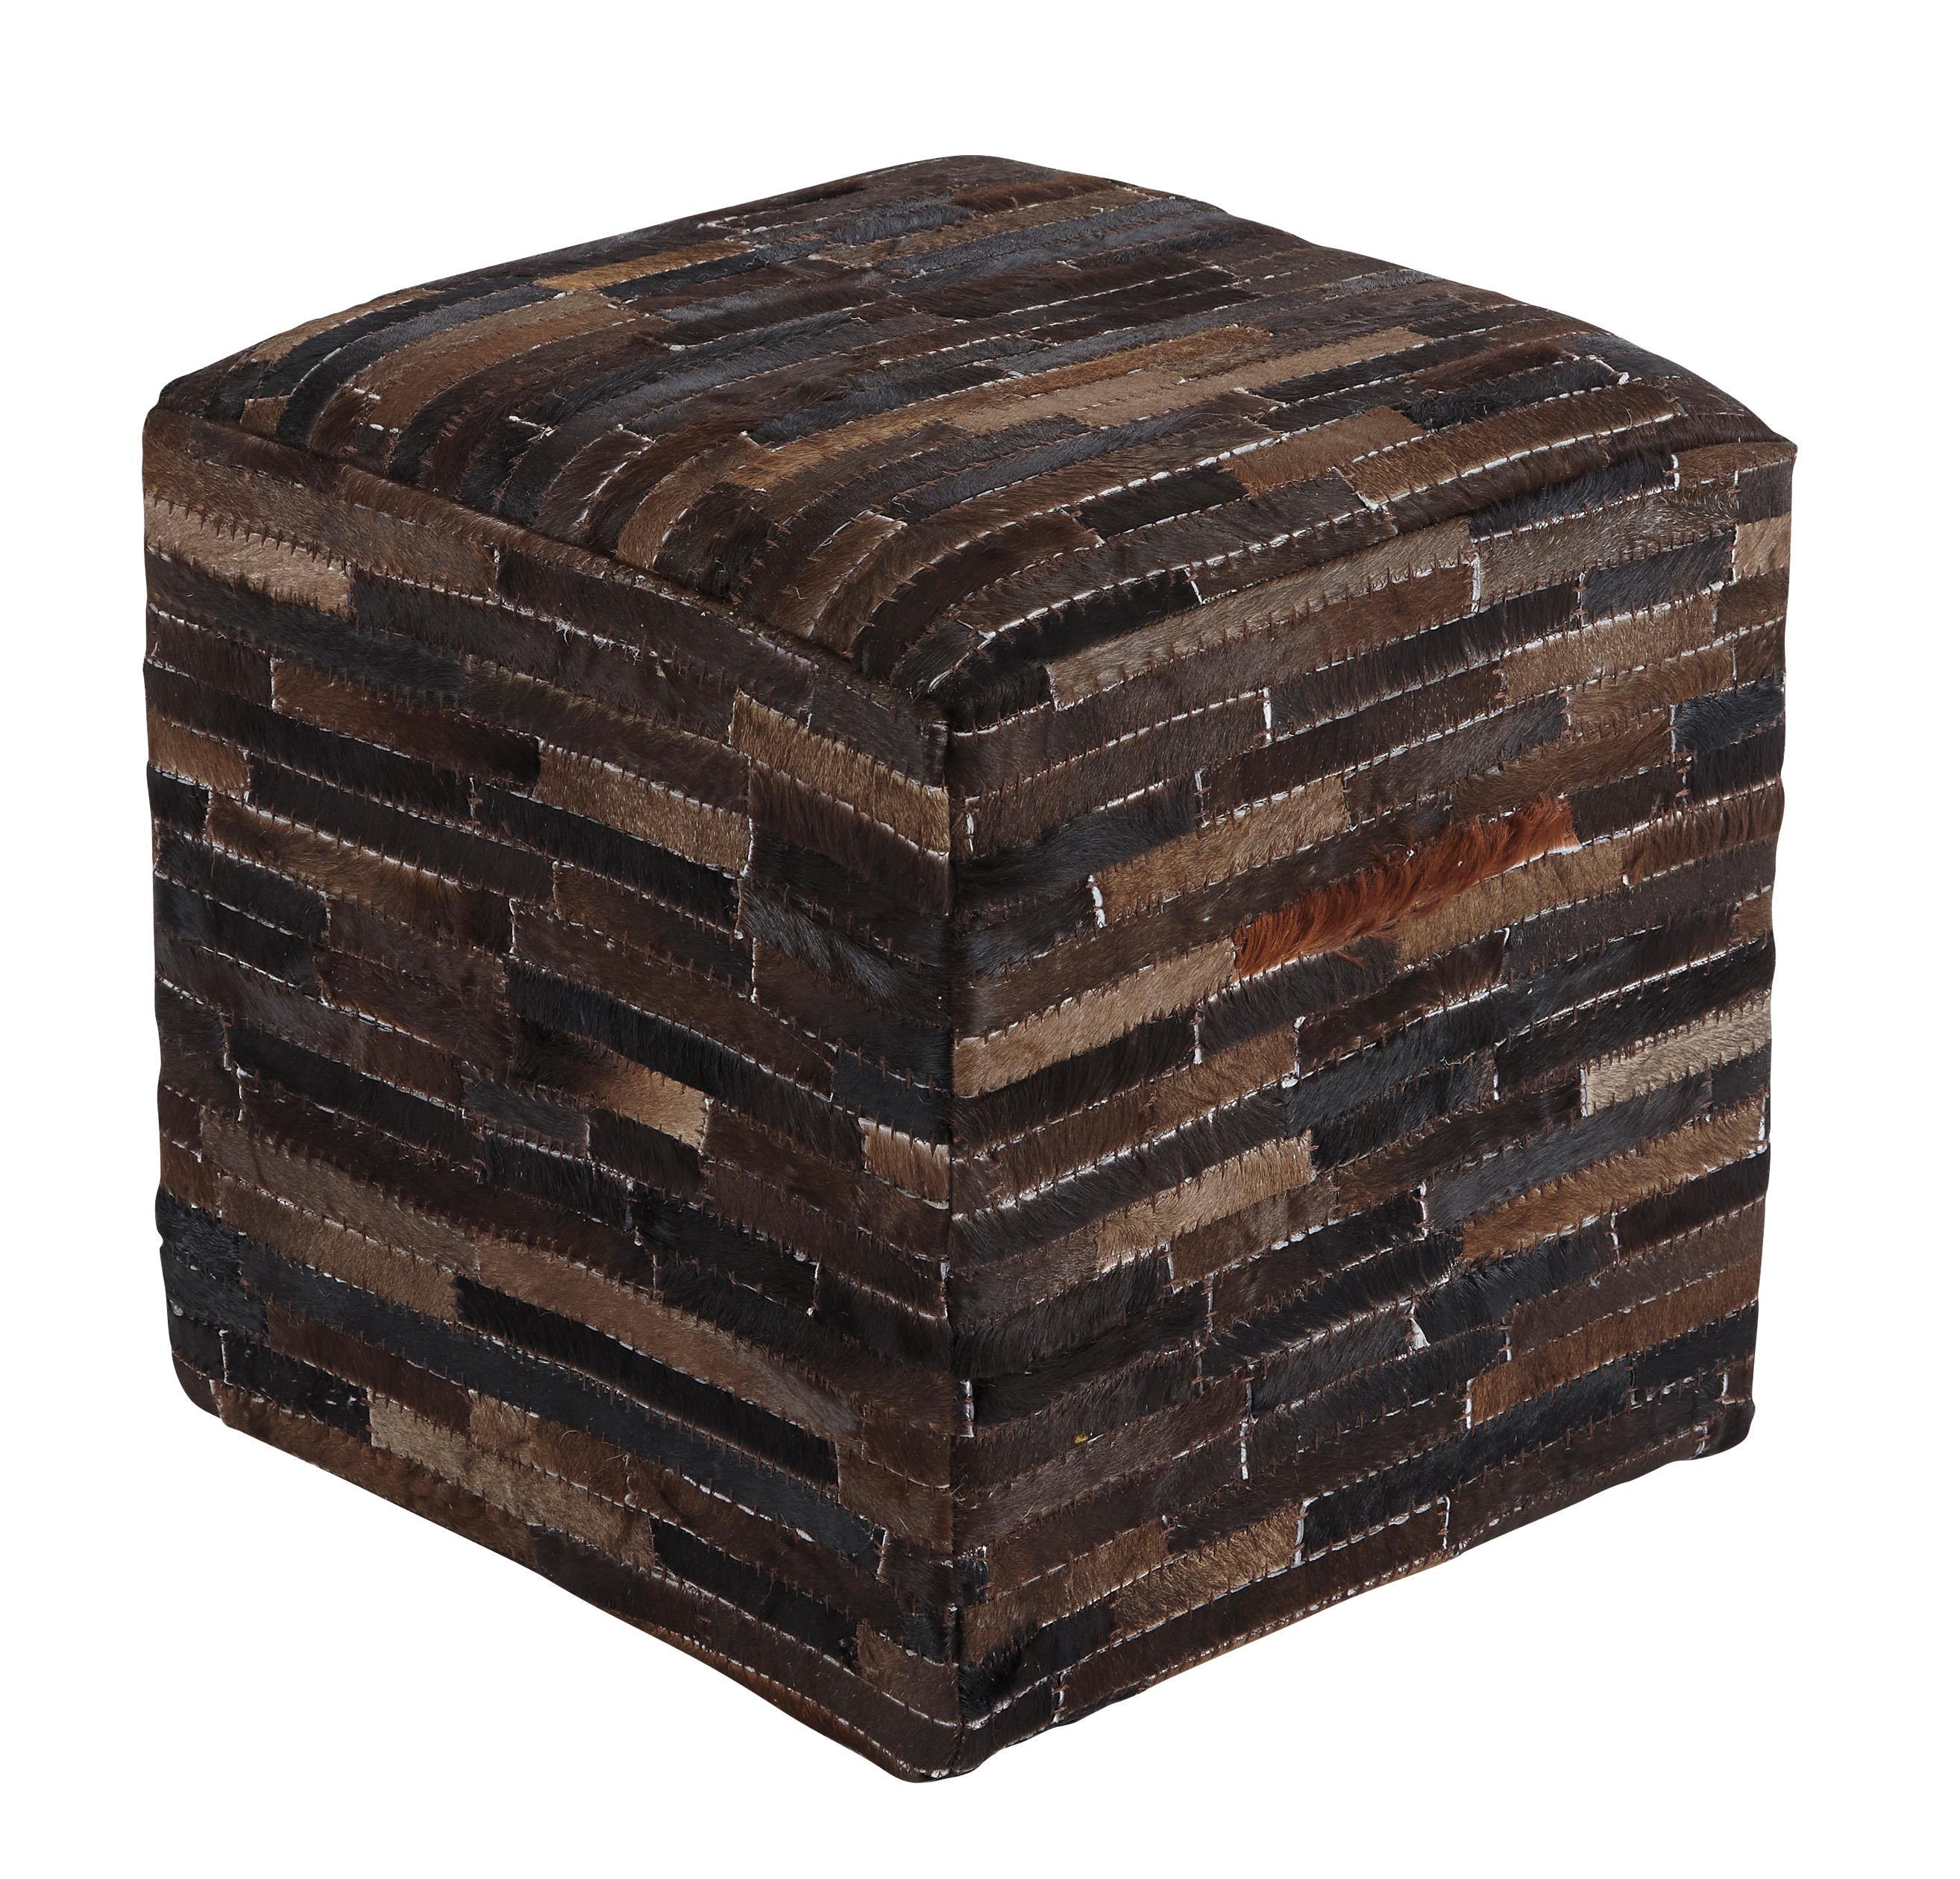 ashley signature design poufs a1000448 cowhide dark. Black Bedroom Furniture Sets. Home Design Ideas